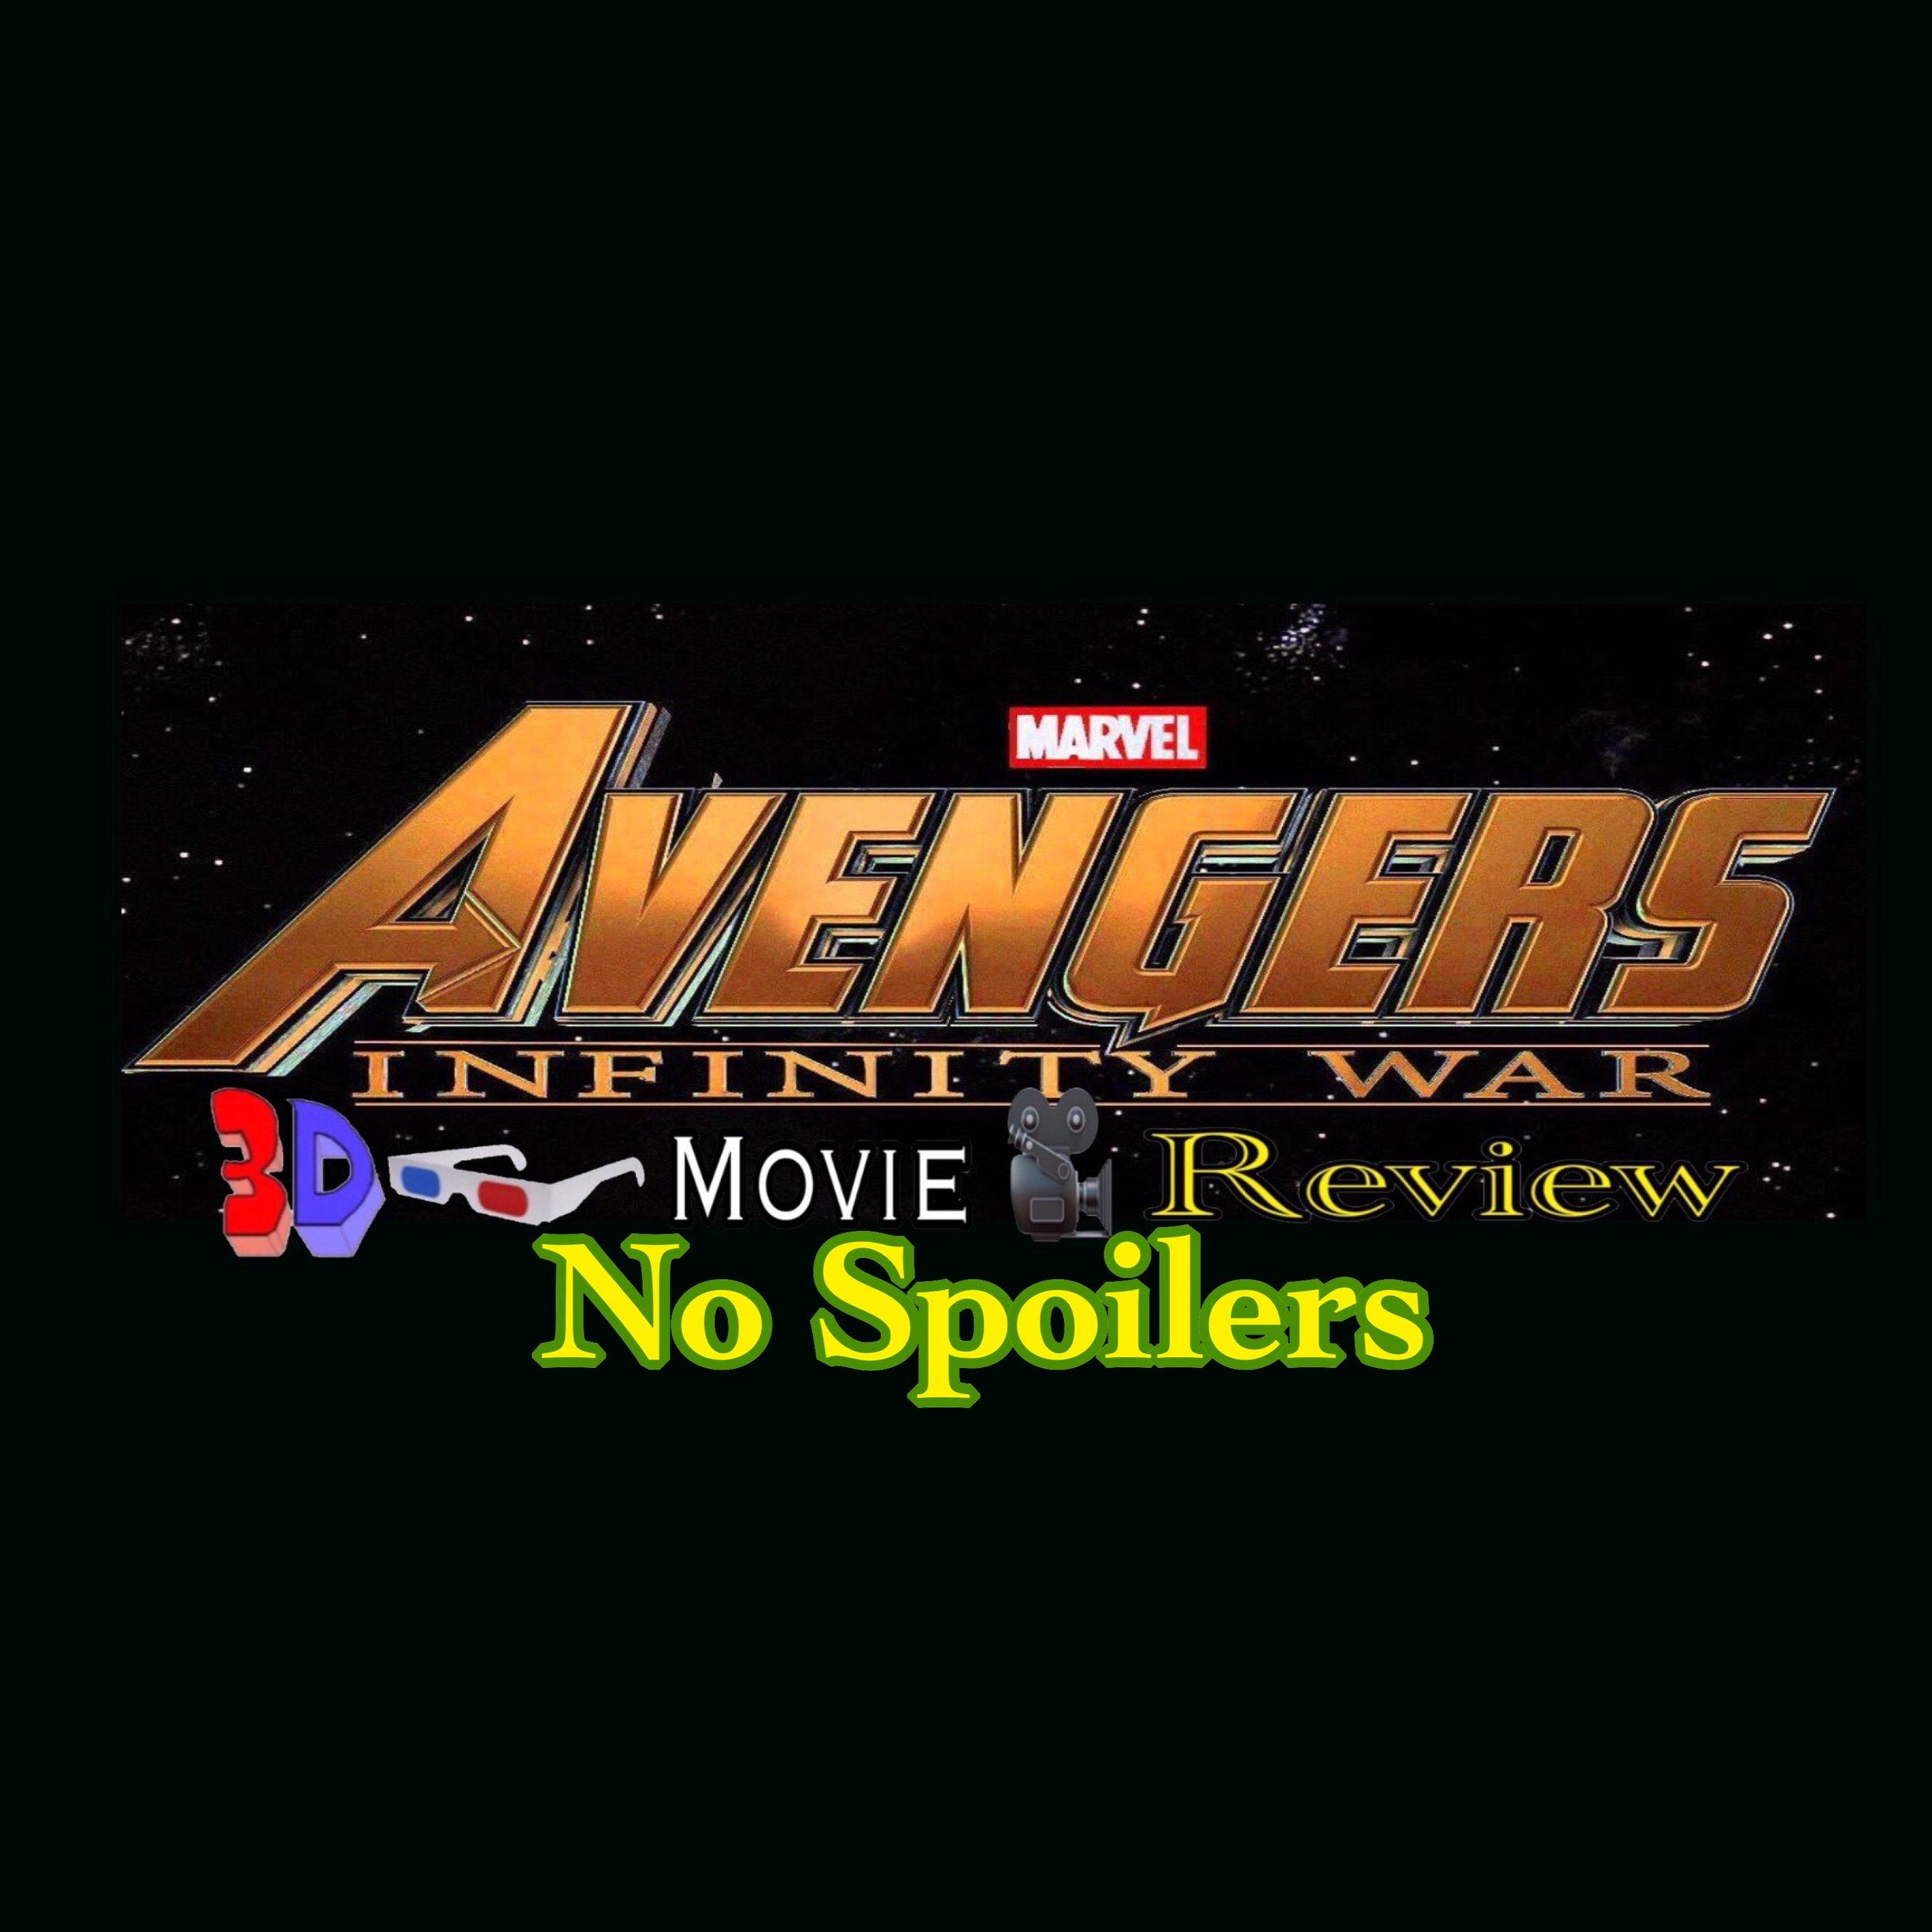 avengers-infinity-war-3d-no-spoiler-movie-review.JPG